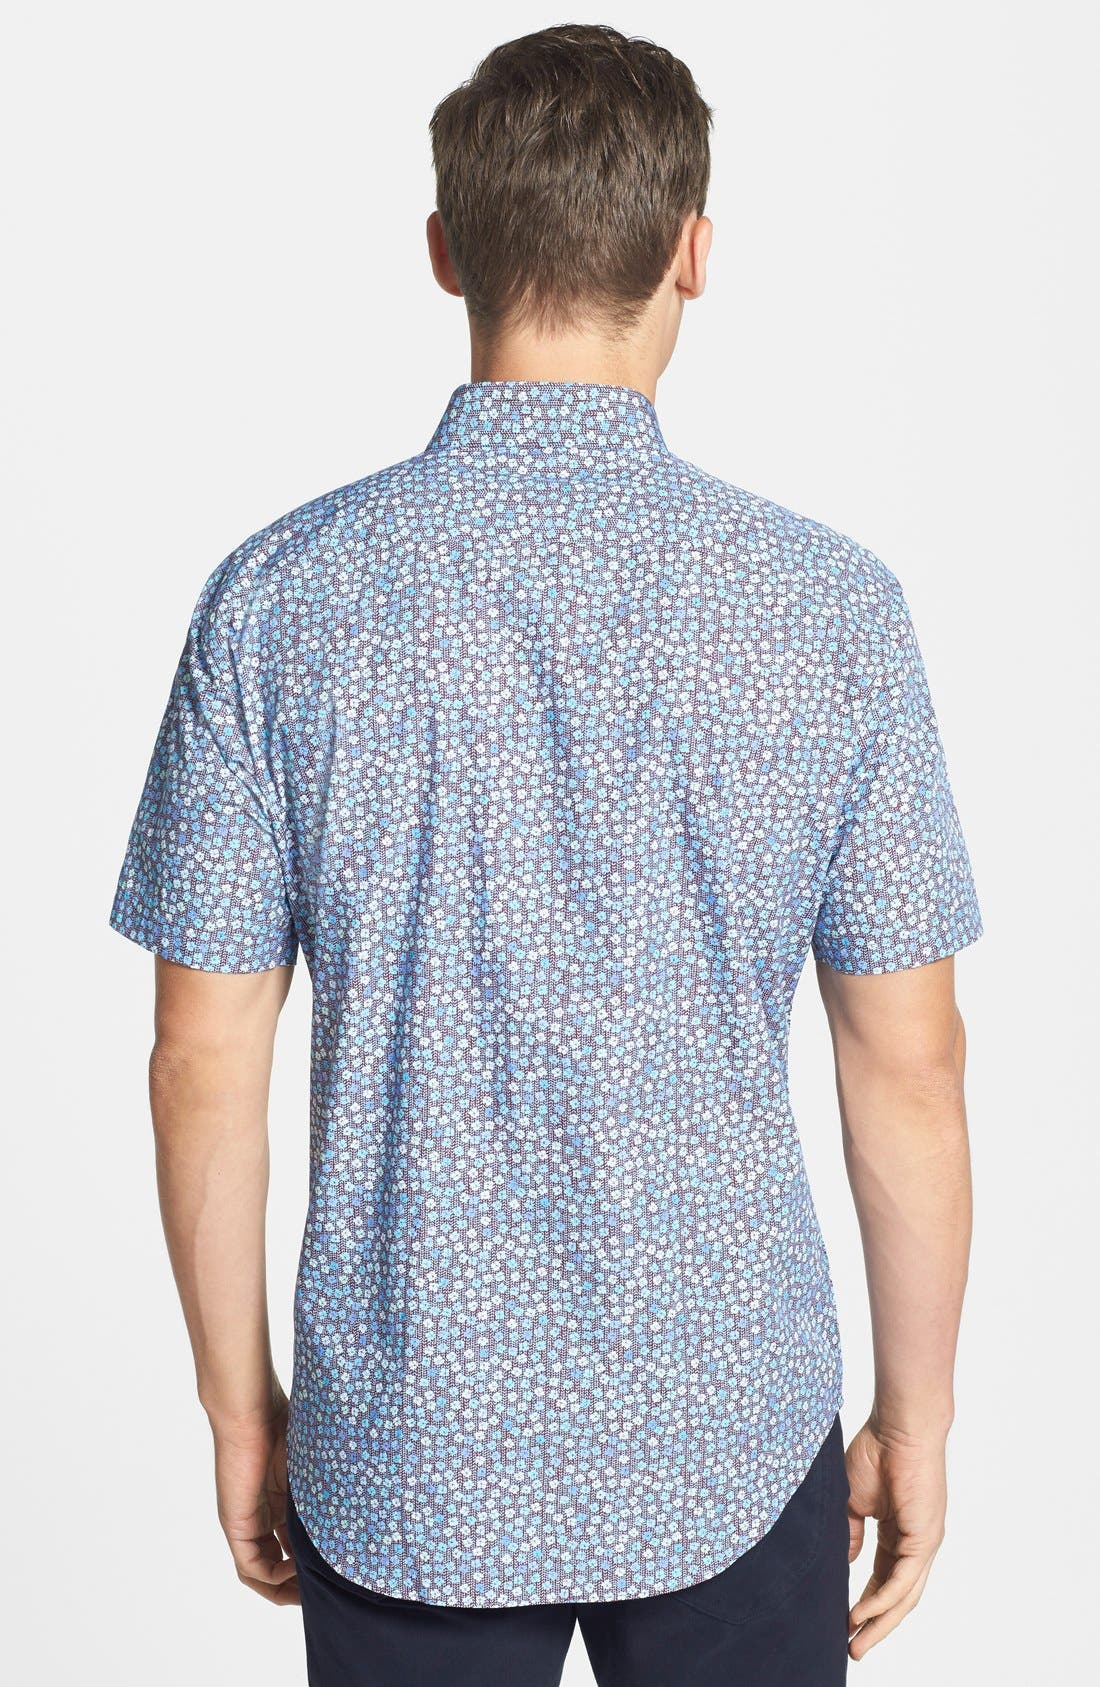 Alternate Image 2  - Zachary Prell 'Roya' Standard Fit Floral Short Sleeve Sport Shirt